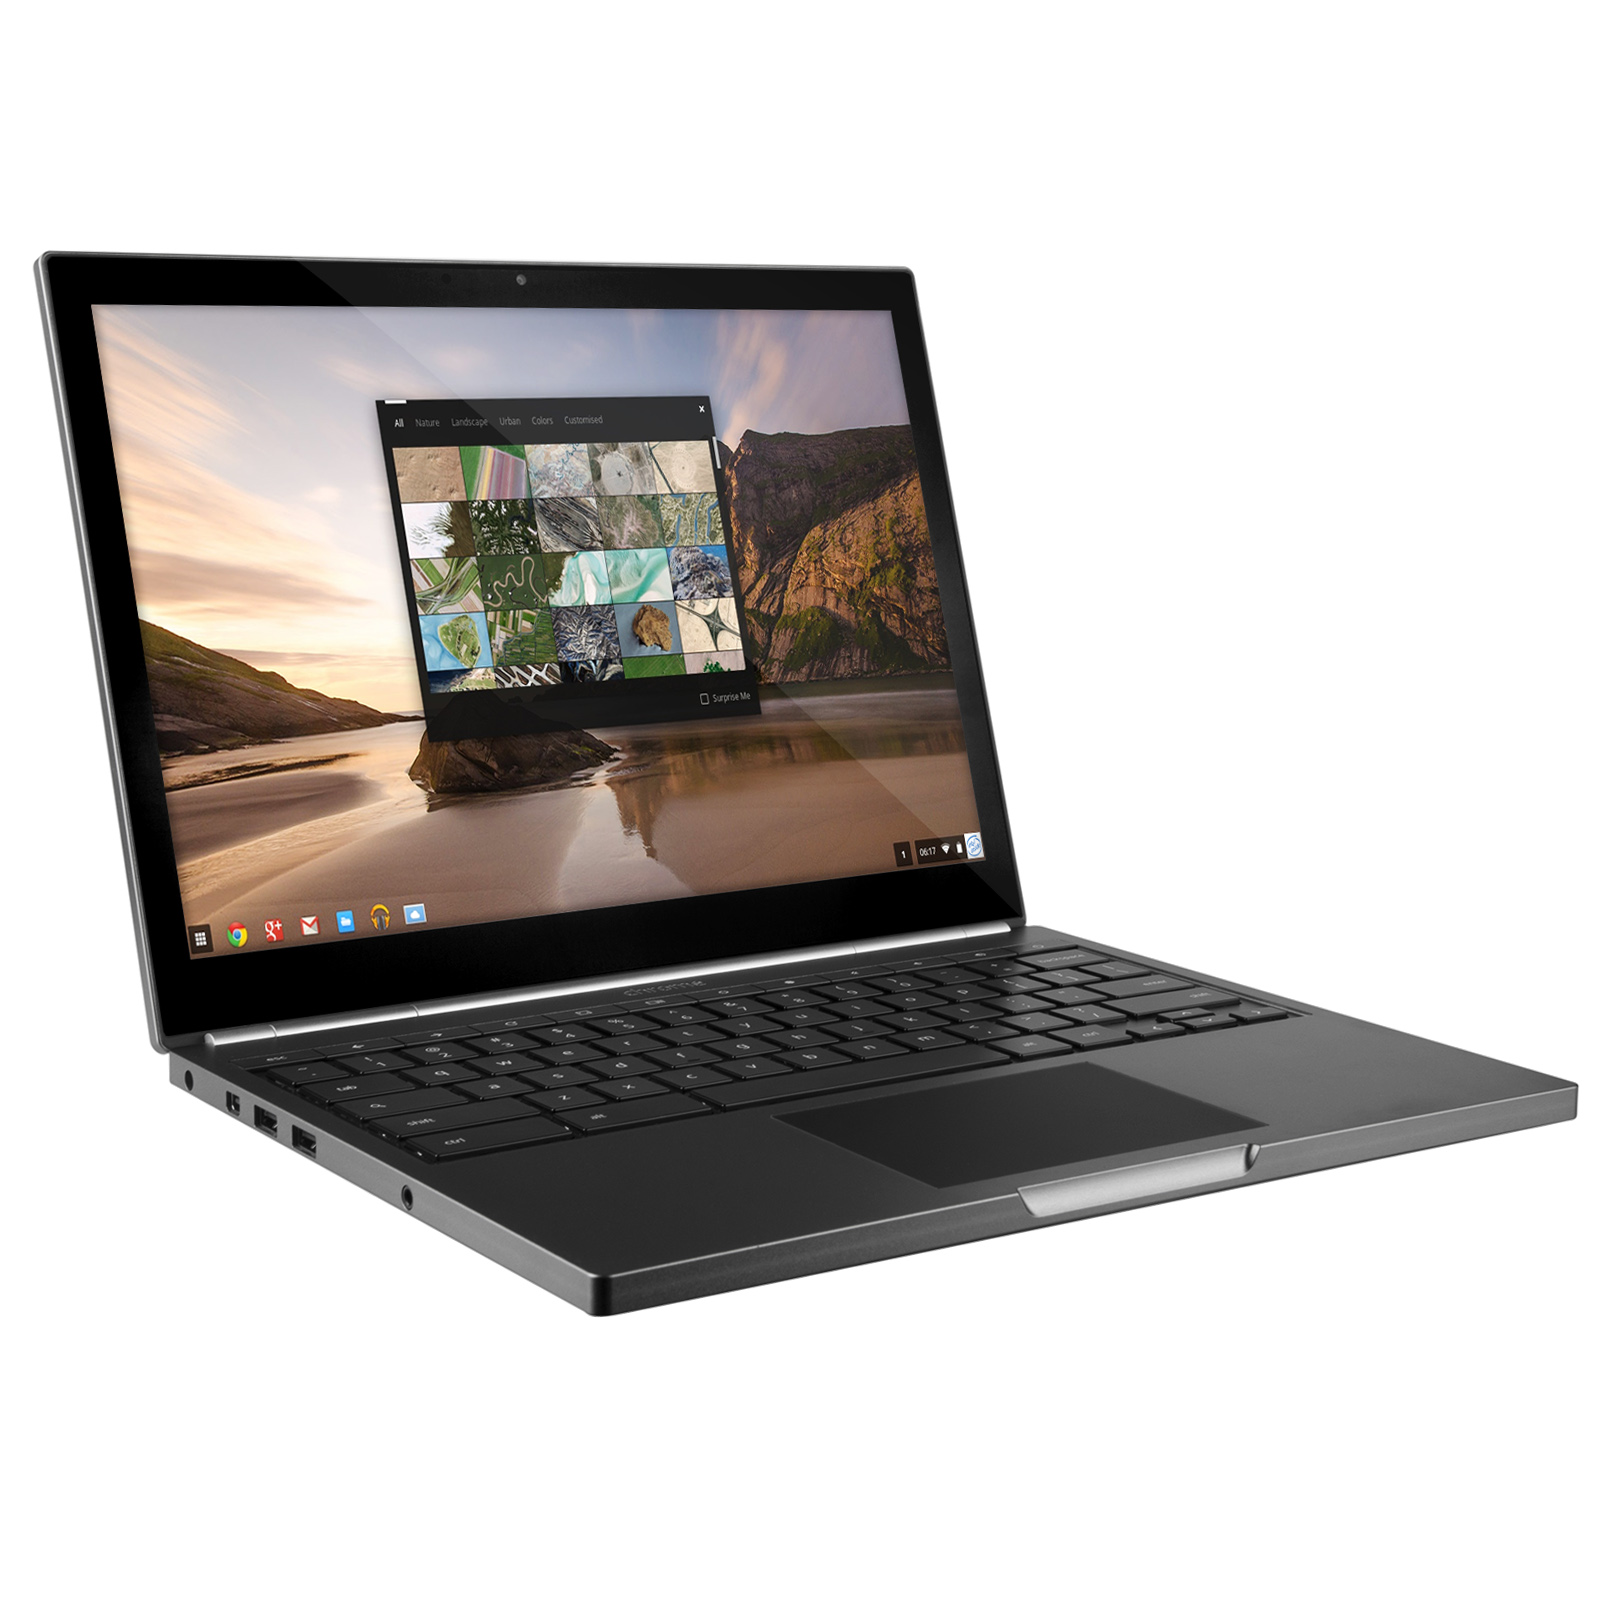 Google Chromebook Pixel 64GB WiFi + LTE Laptop